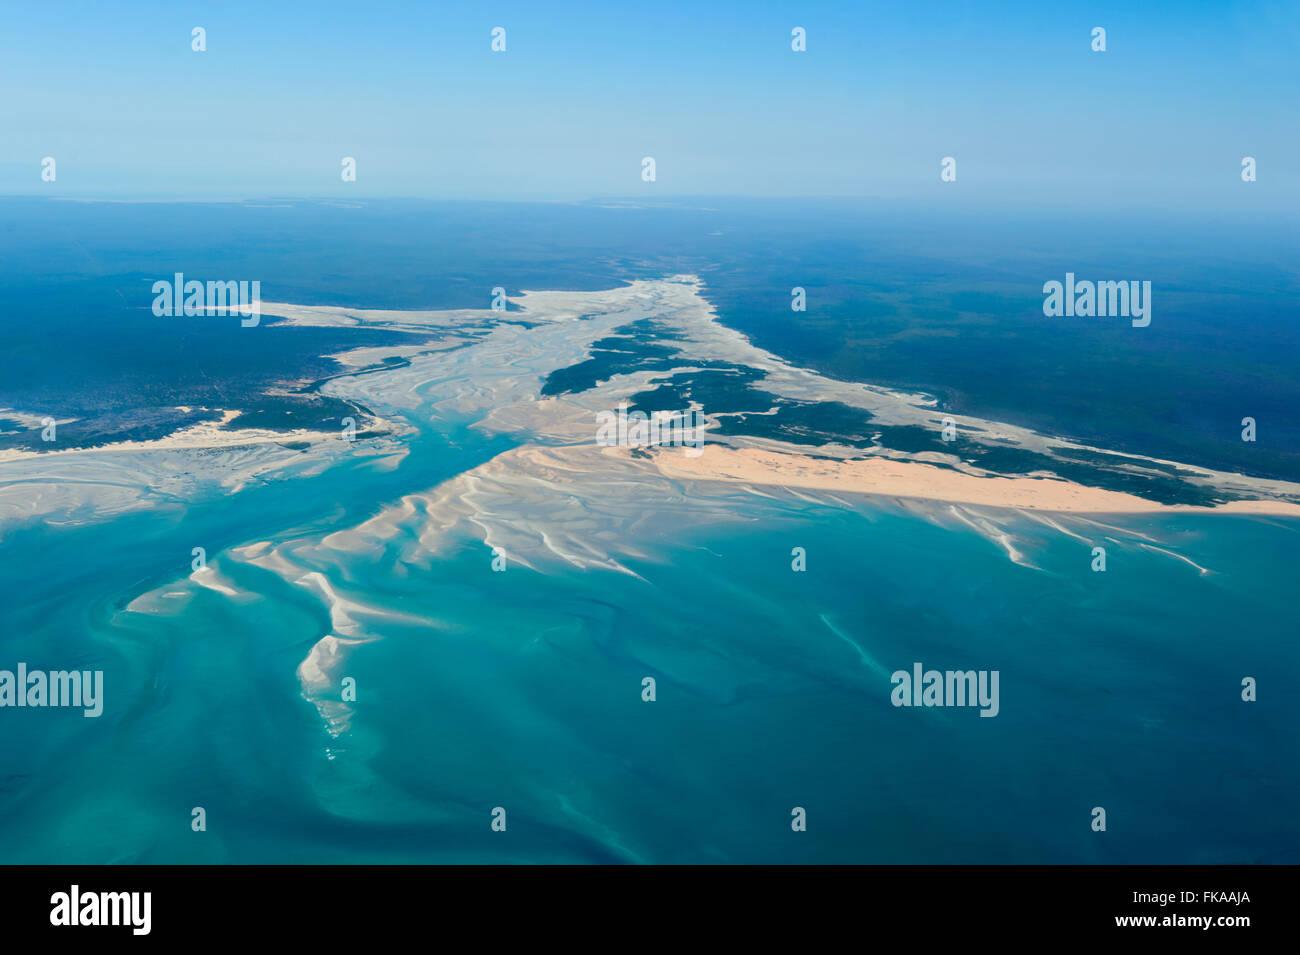 Vista aérea de la costa septentrional de Australia Occidental Foto de stock